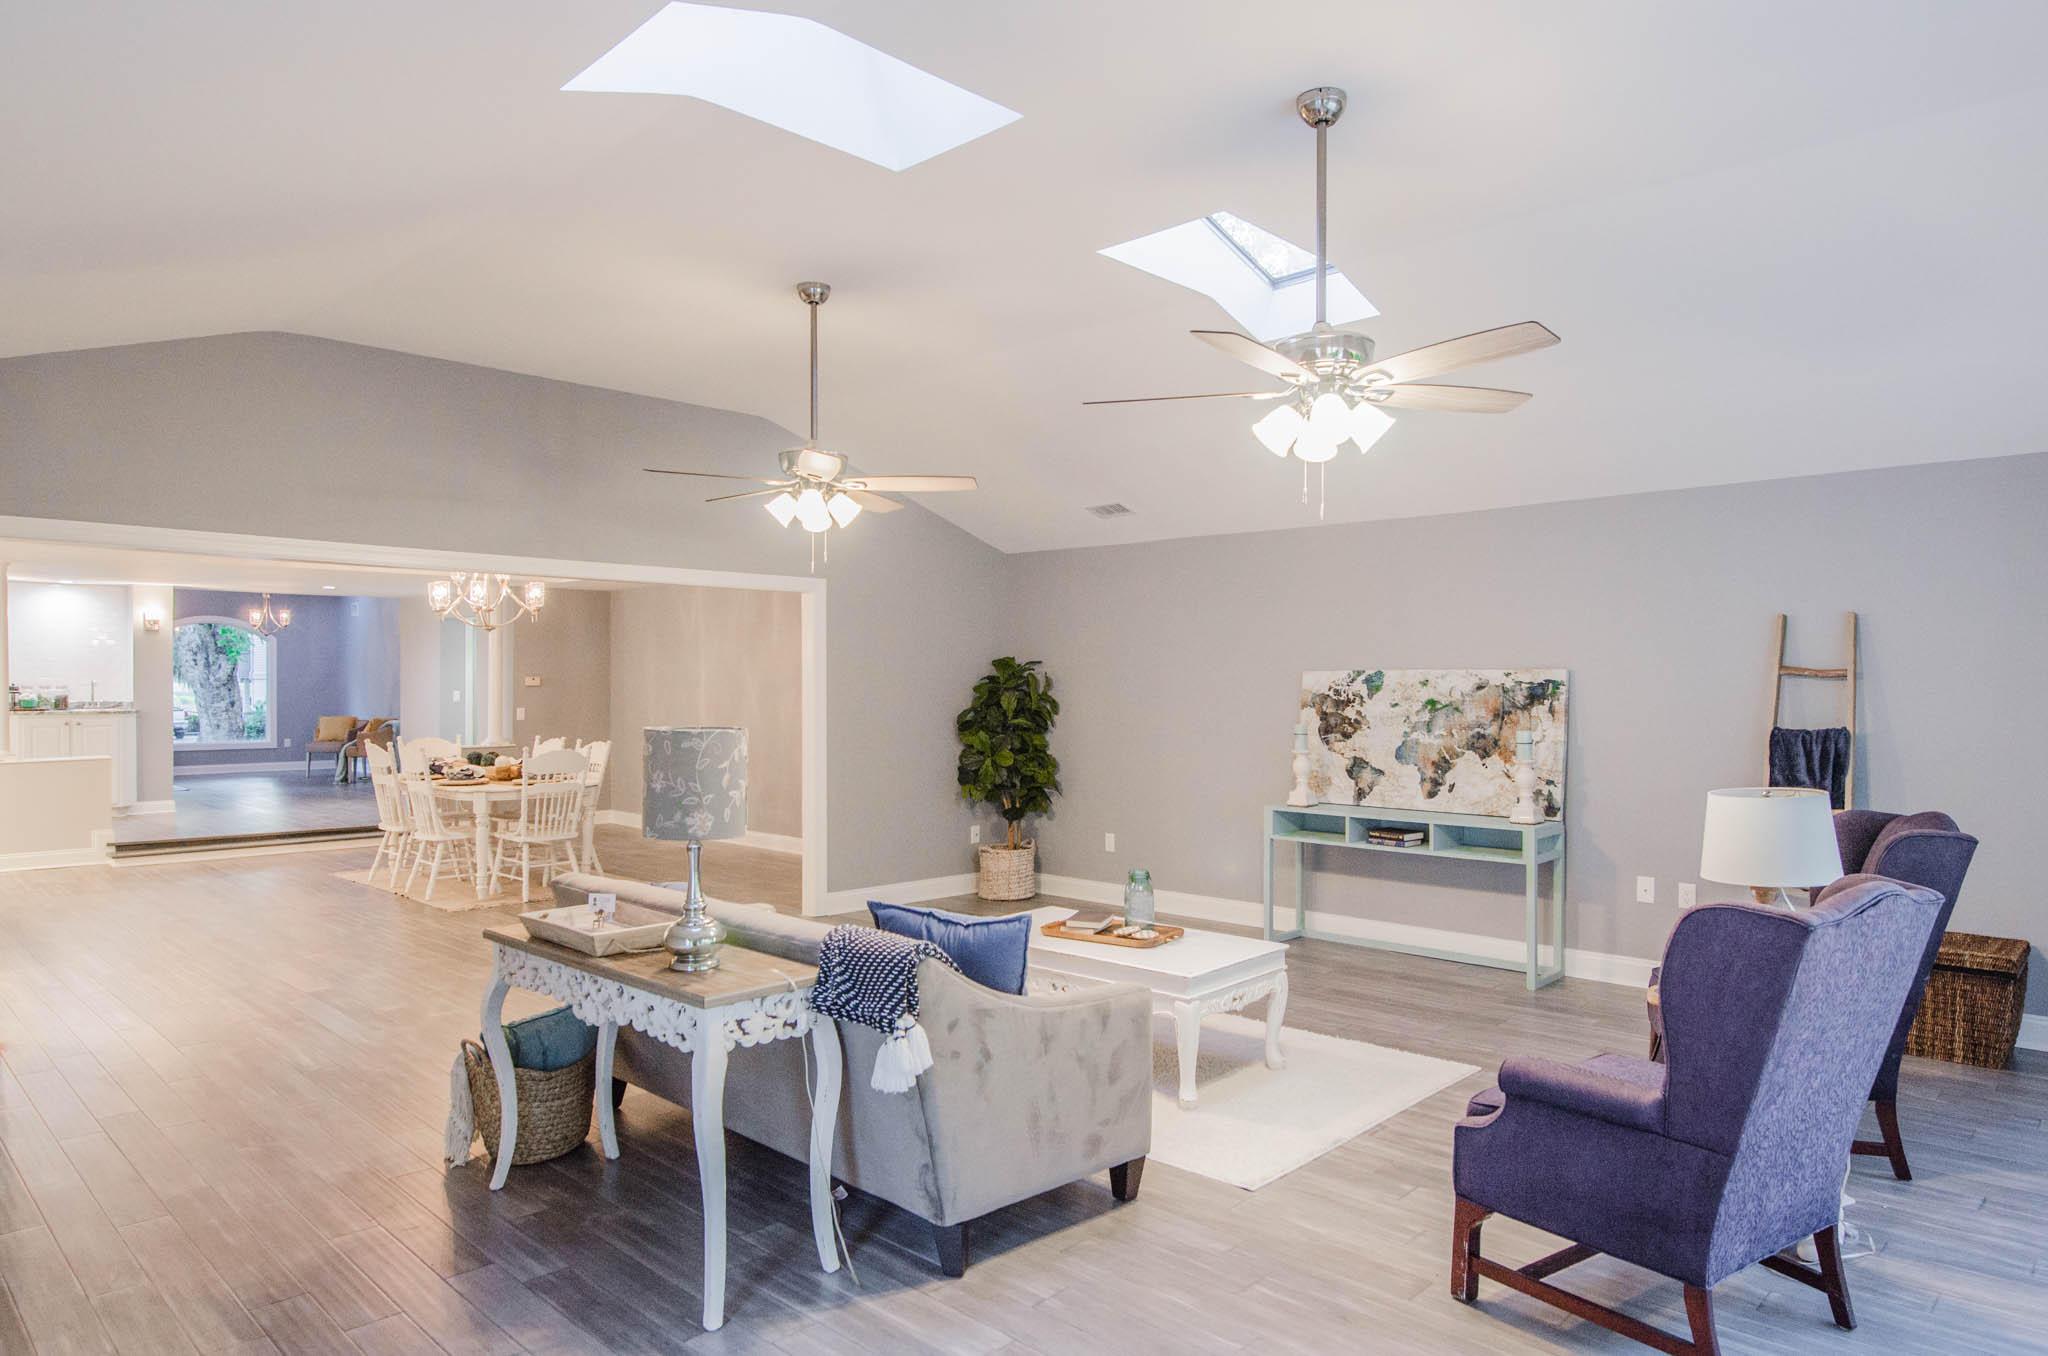 Covington Hills Homes For Sale - 5886 Ryans Bluff, North Charleston, SC - 5